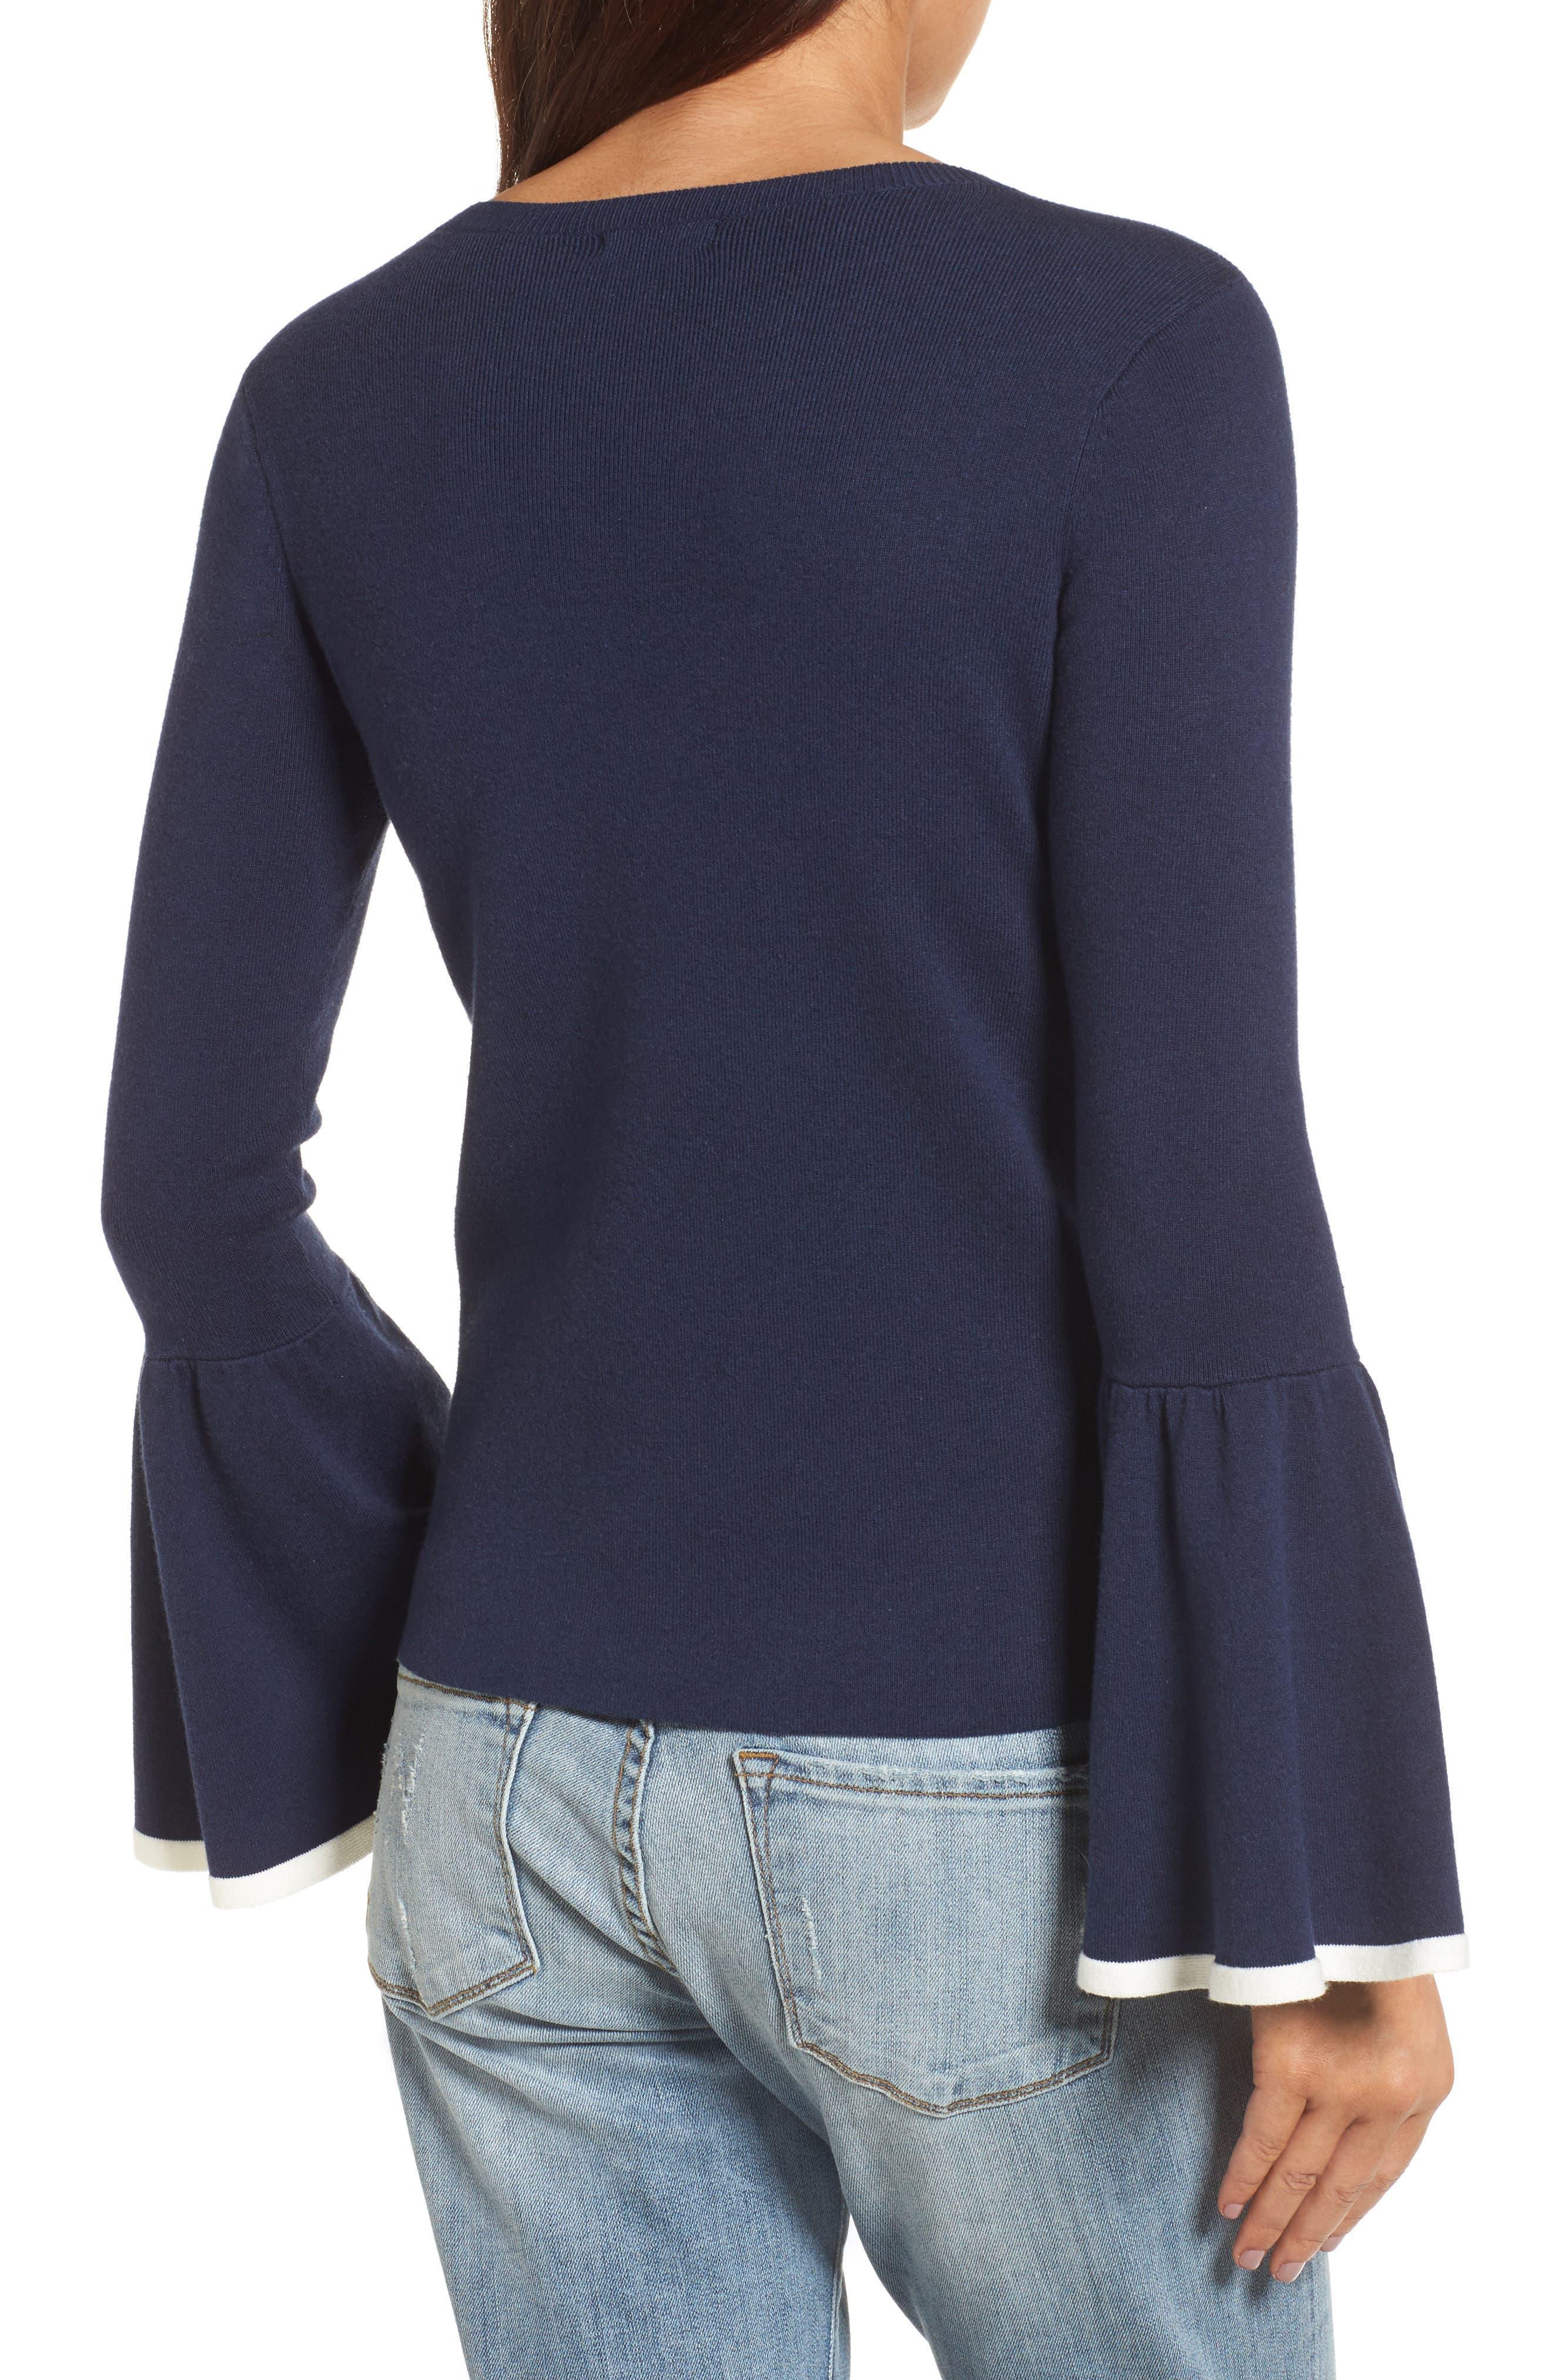 Flare Sleeve Sweater,                             Alternate thumbnail 3, color,                             Navy Peacoat